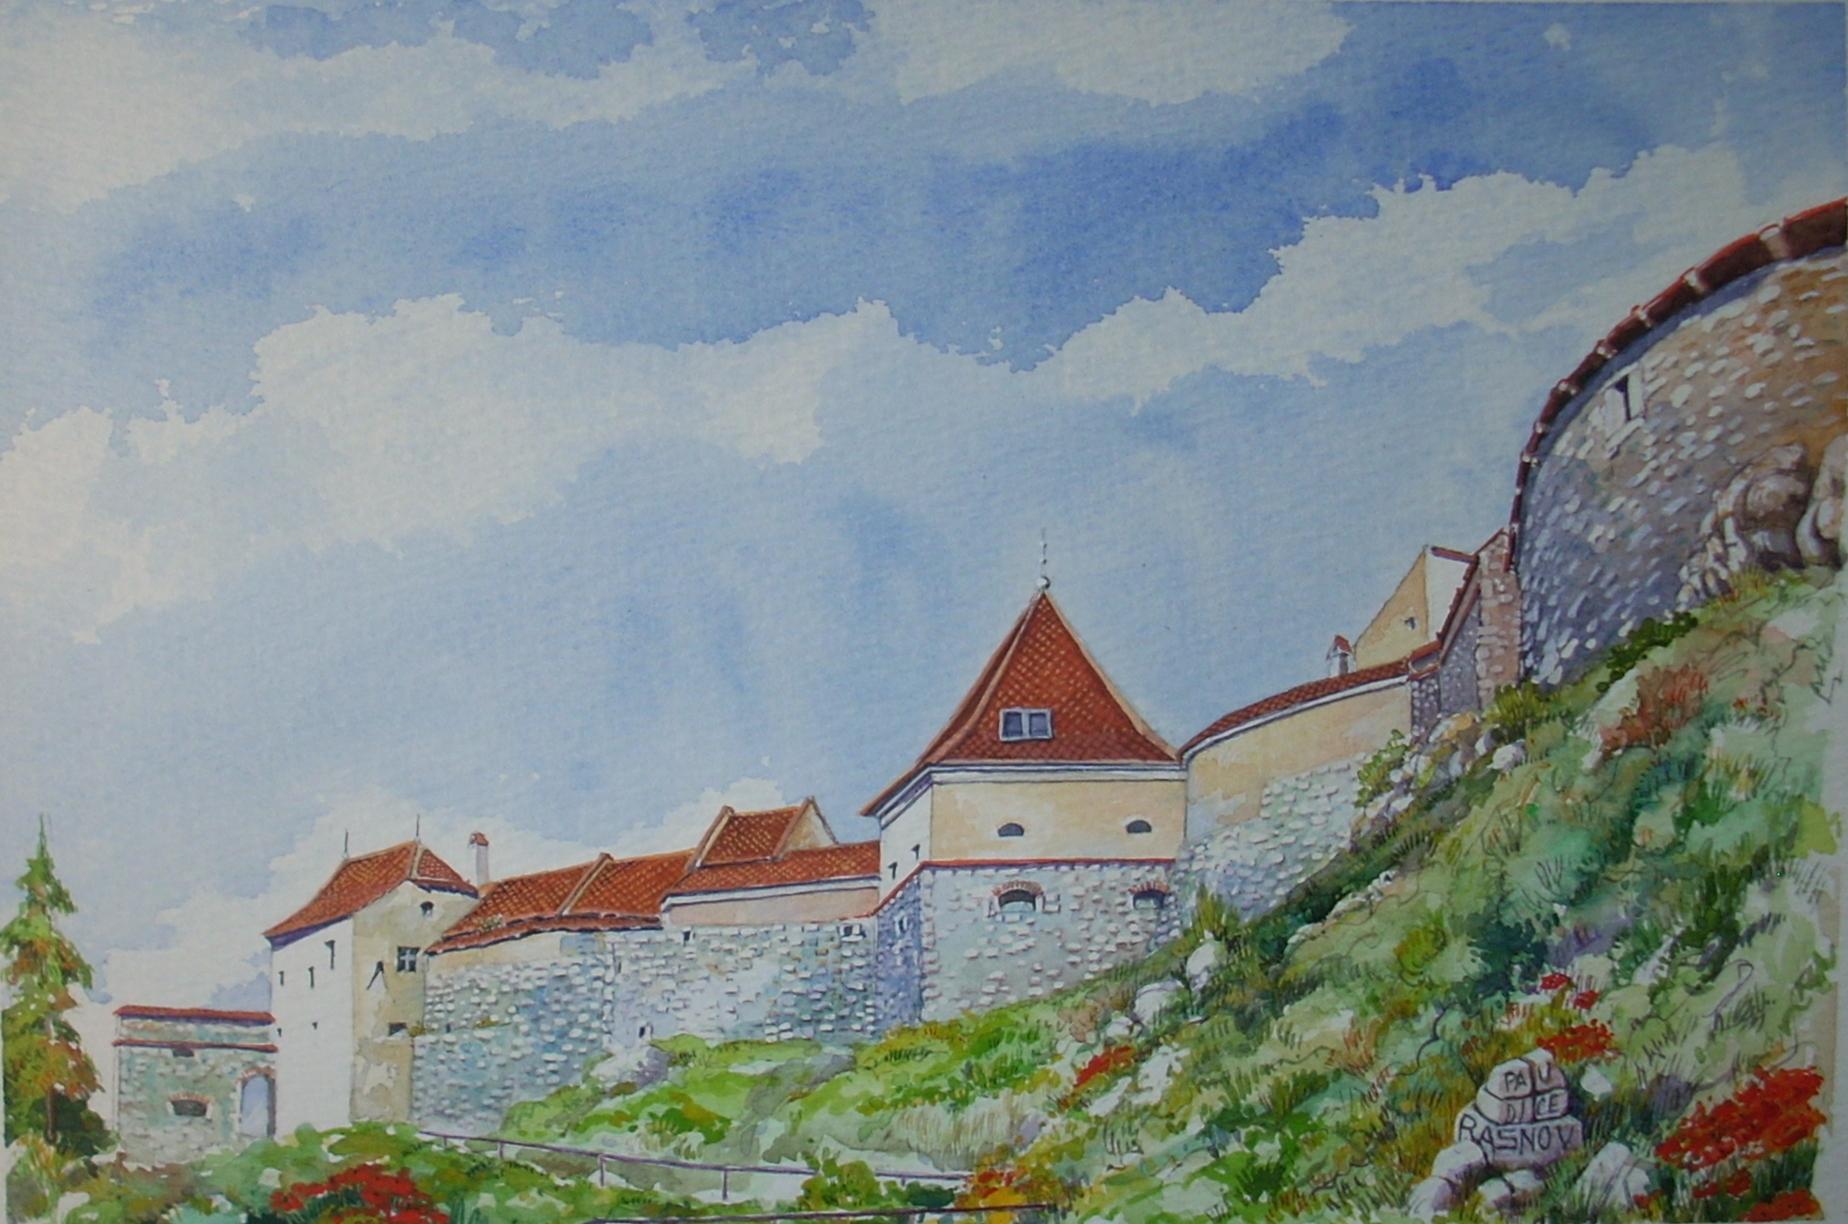 Vincenzo Paudice - Transilvania, Villaggio fortificato di Râșnov